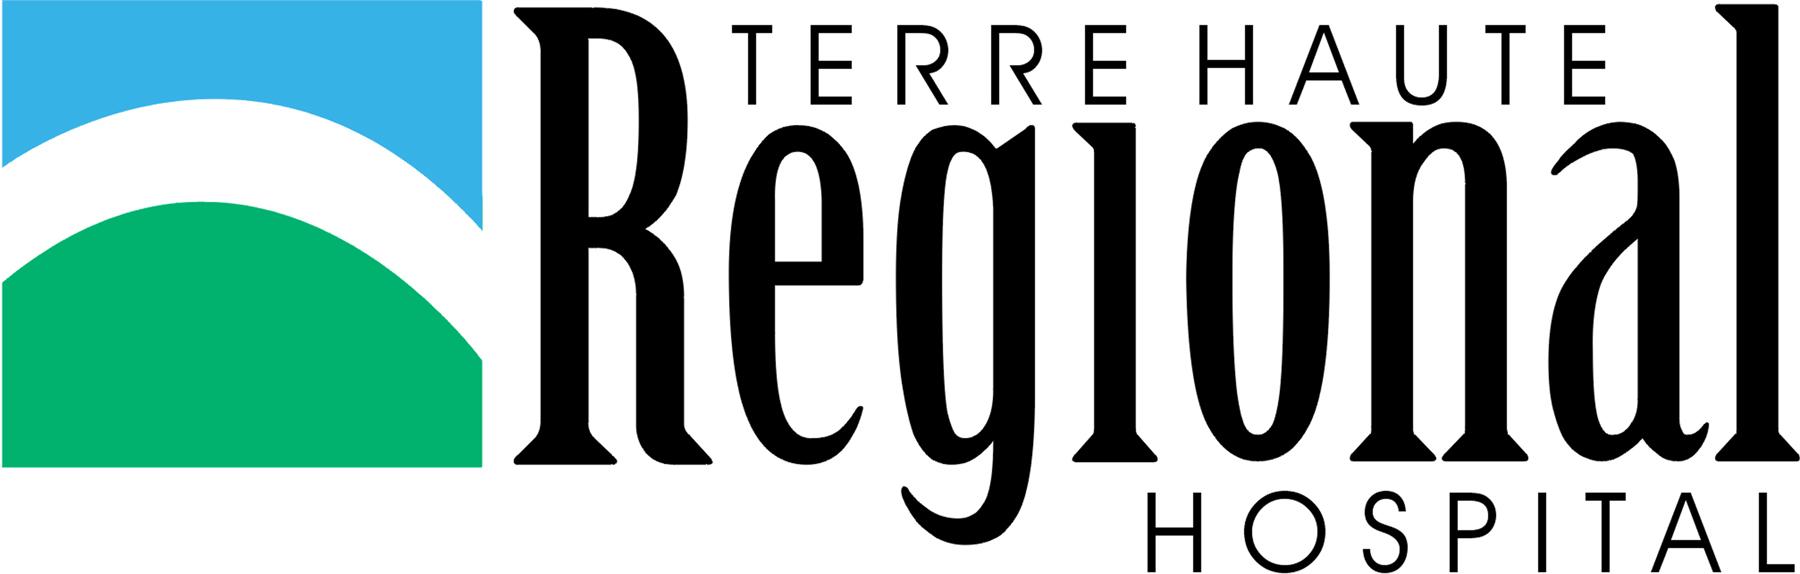 Terre Huate Regional Hospital